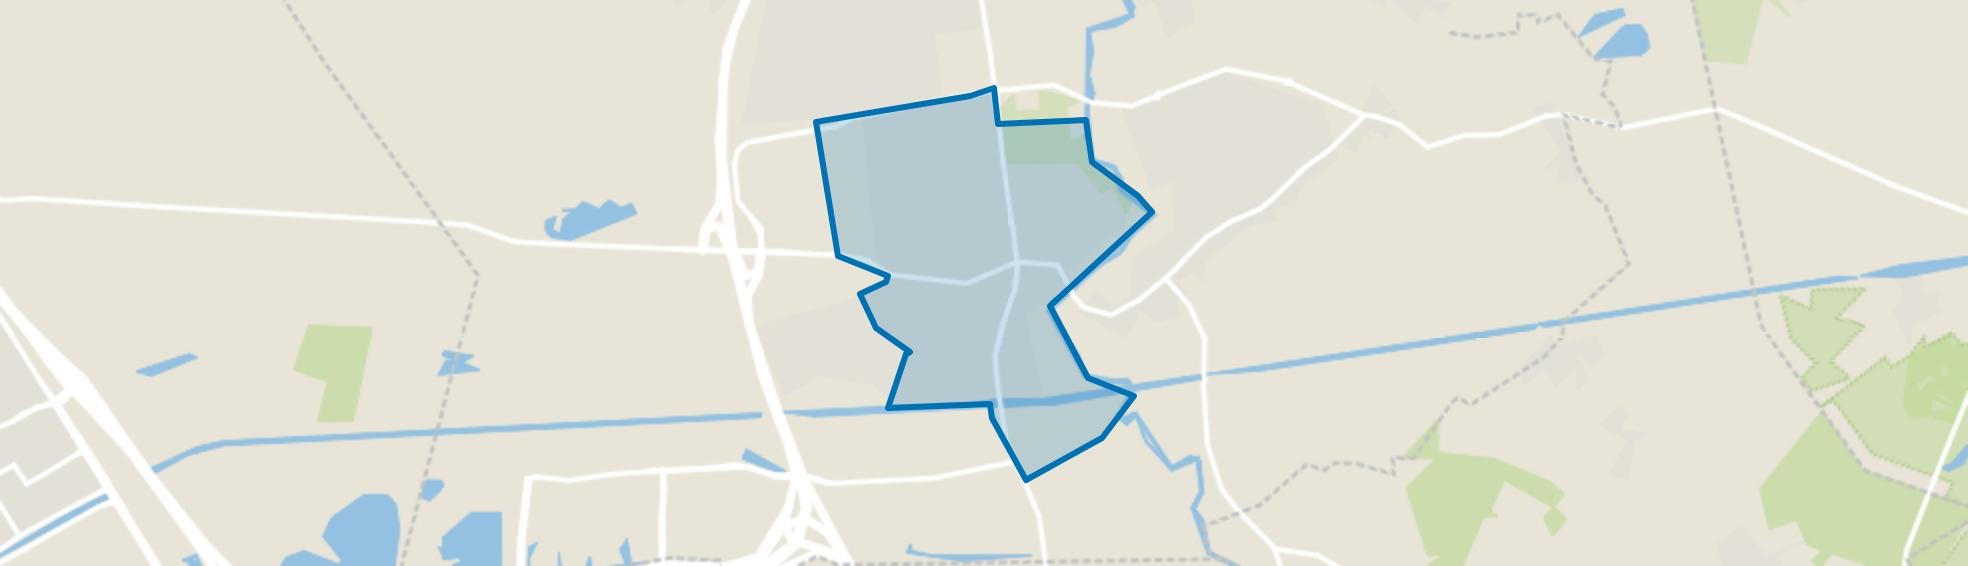 Son, Son en Breugel map